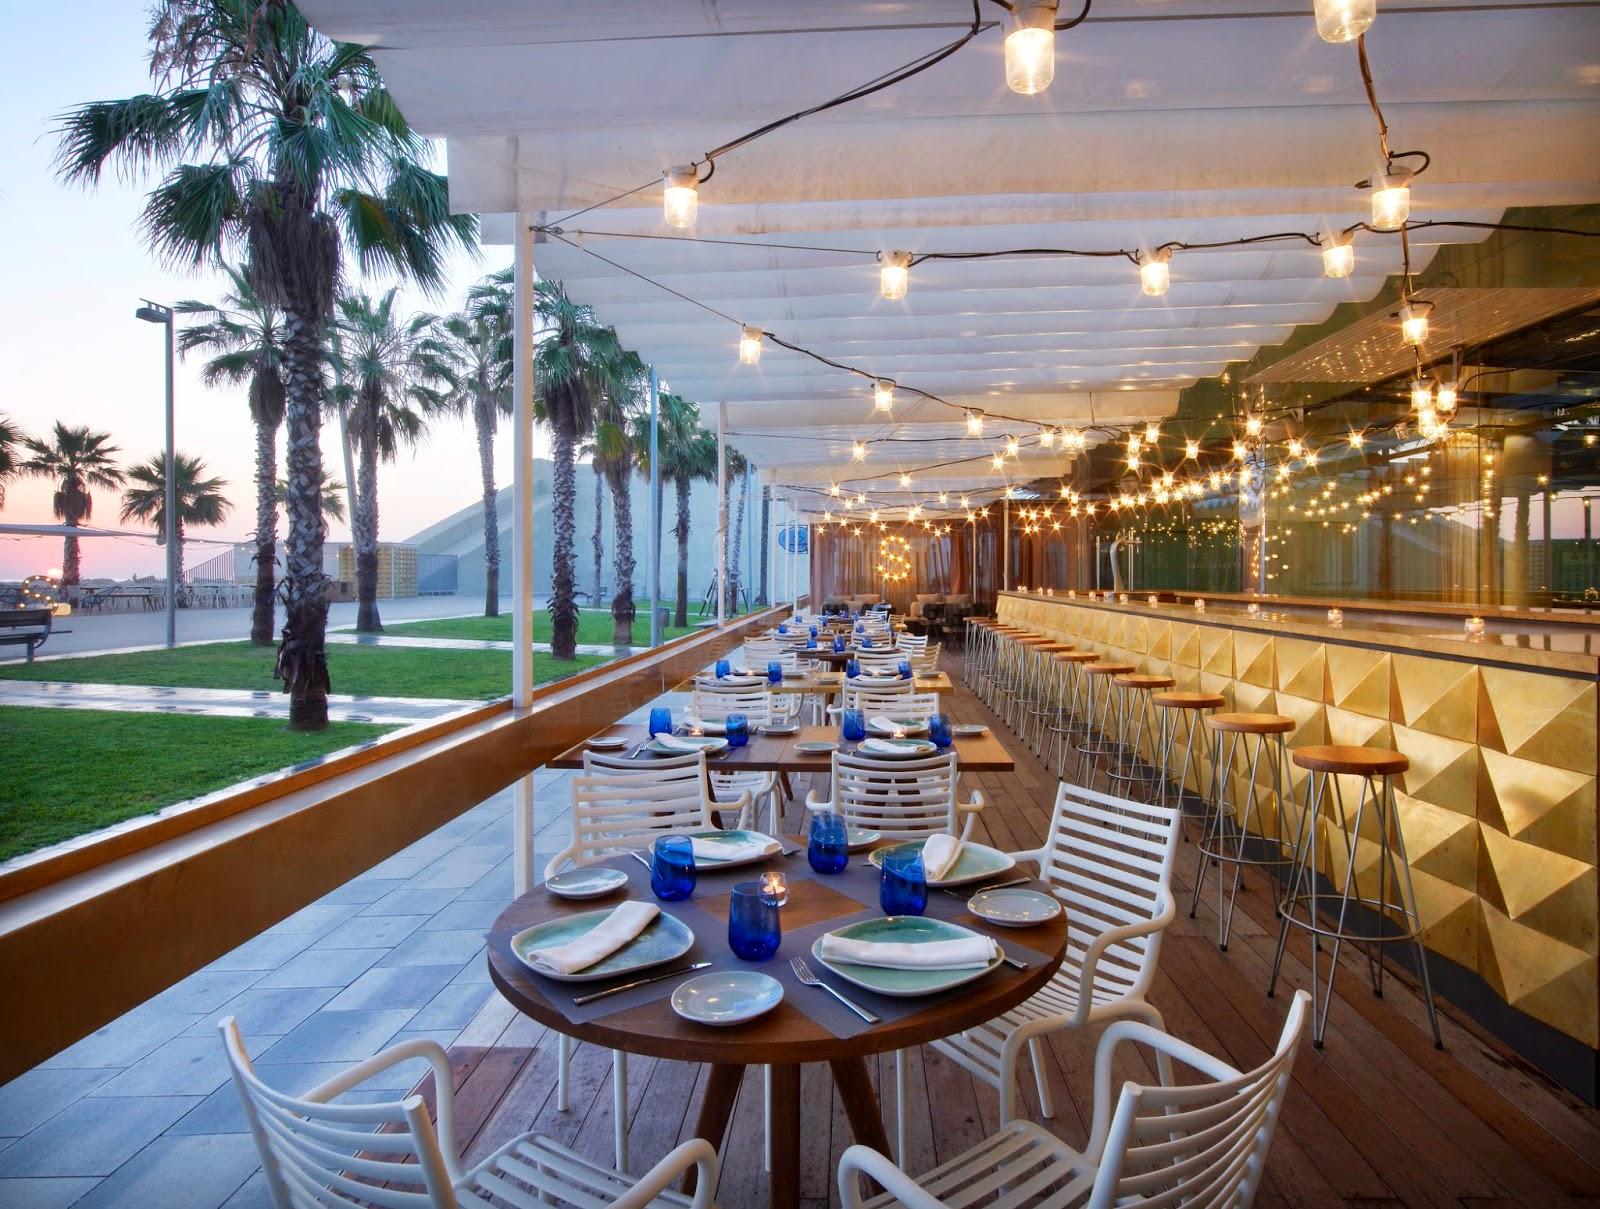 Salt beach club barcelona s nia graupera graupix for Beach club barcelona